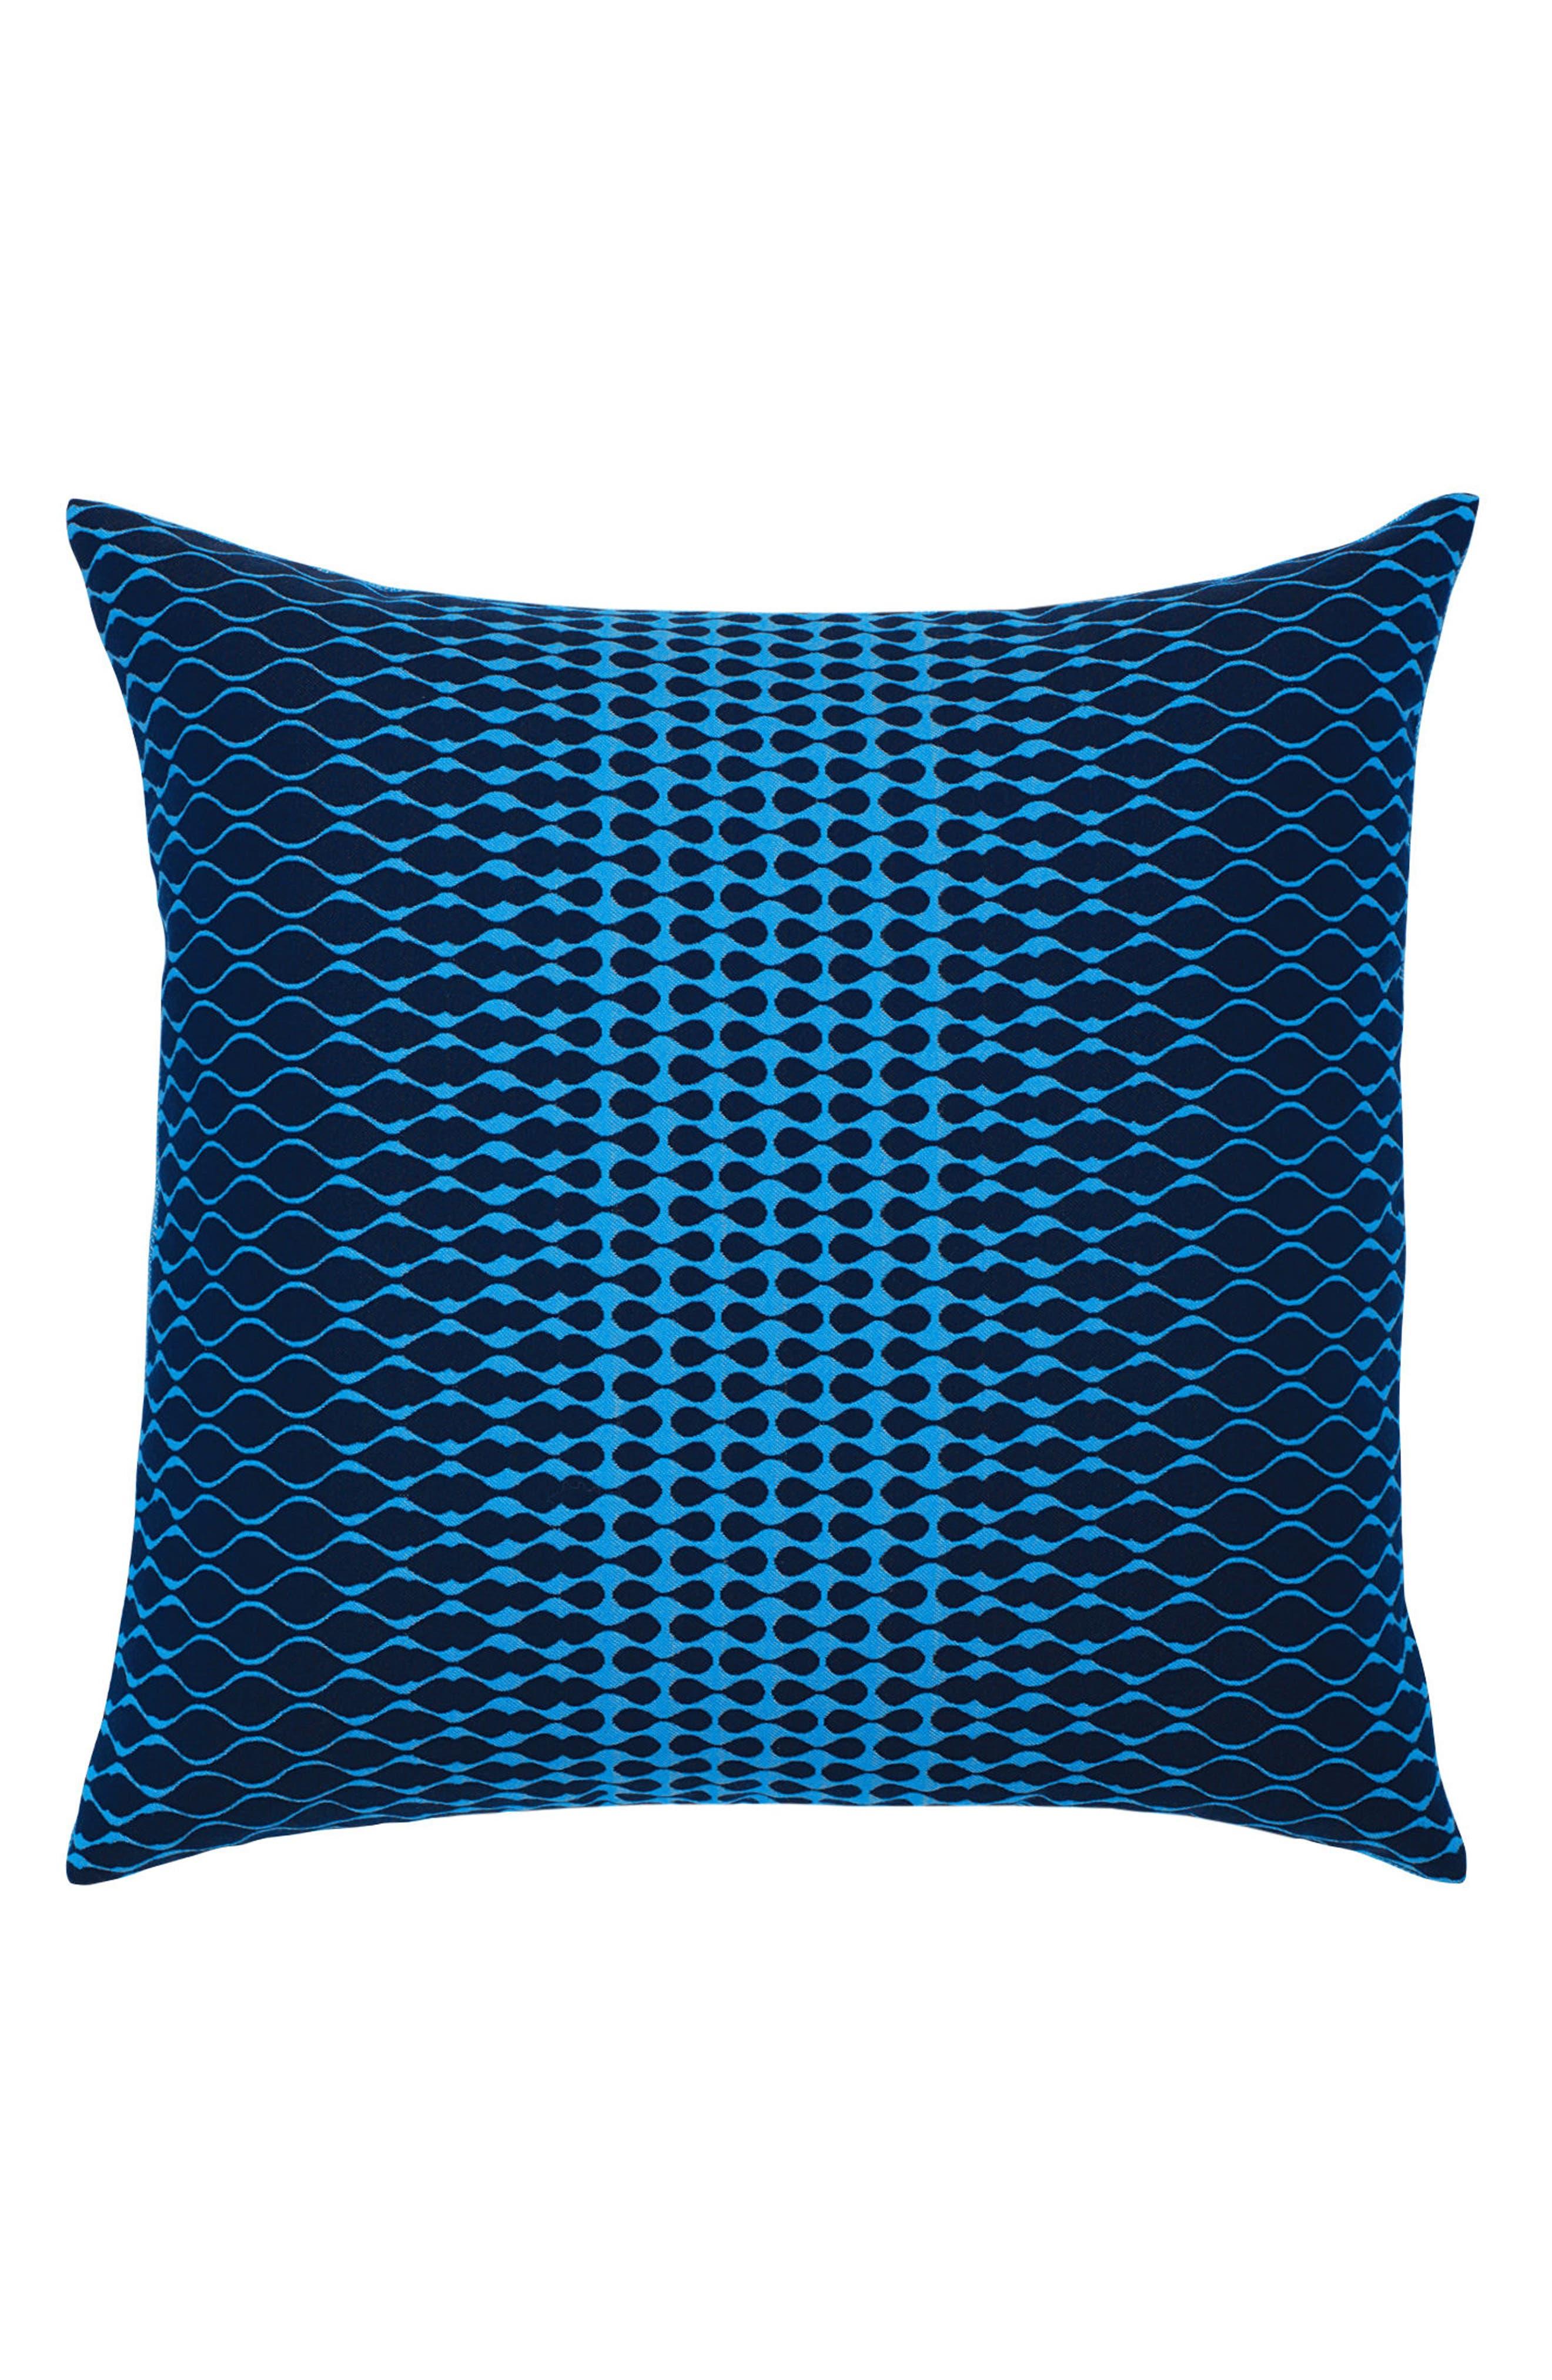 Optic Azure Indoor/Outdoor Accent Pillow,                             Main thumbnail 1, color,                             400